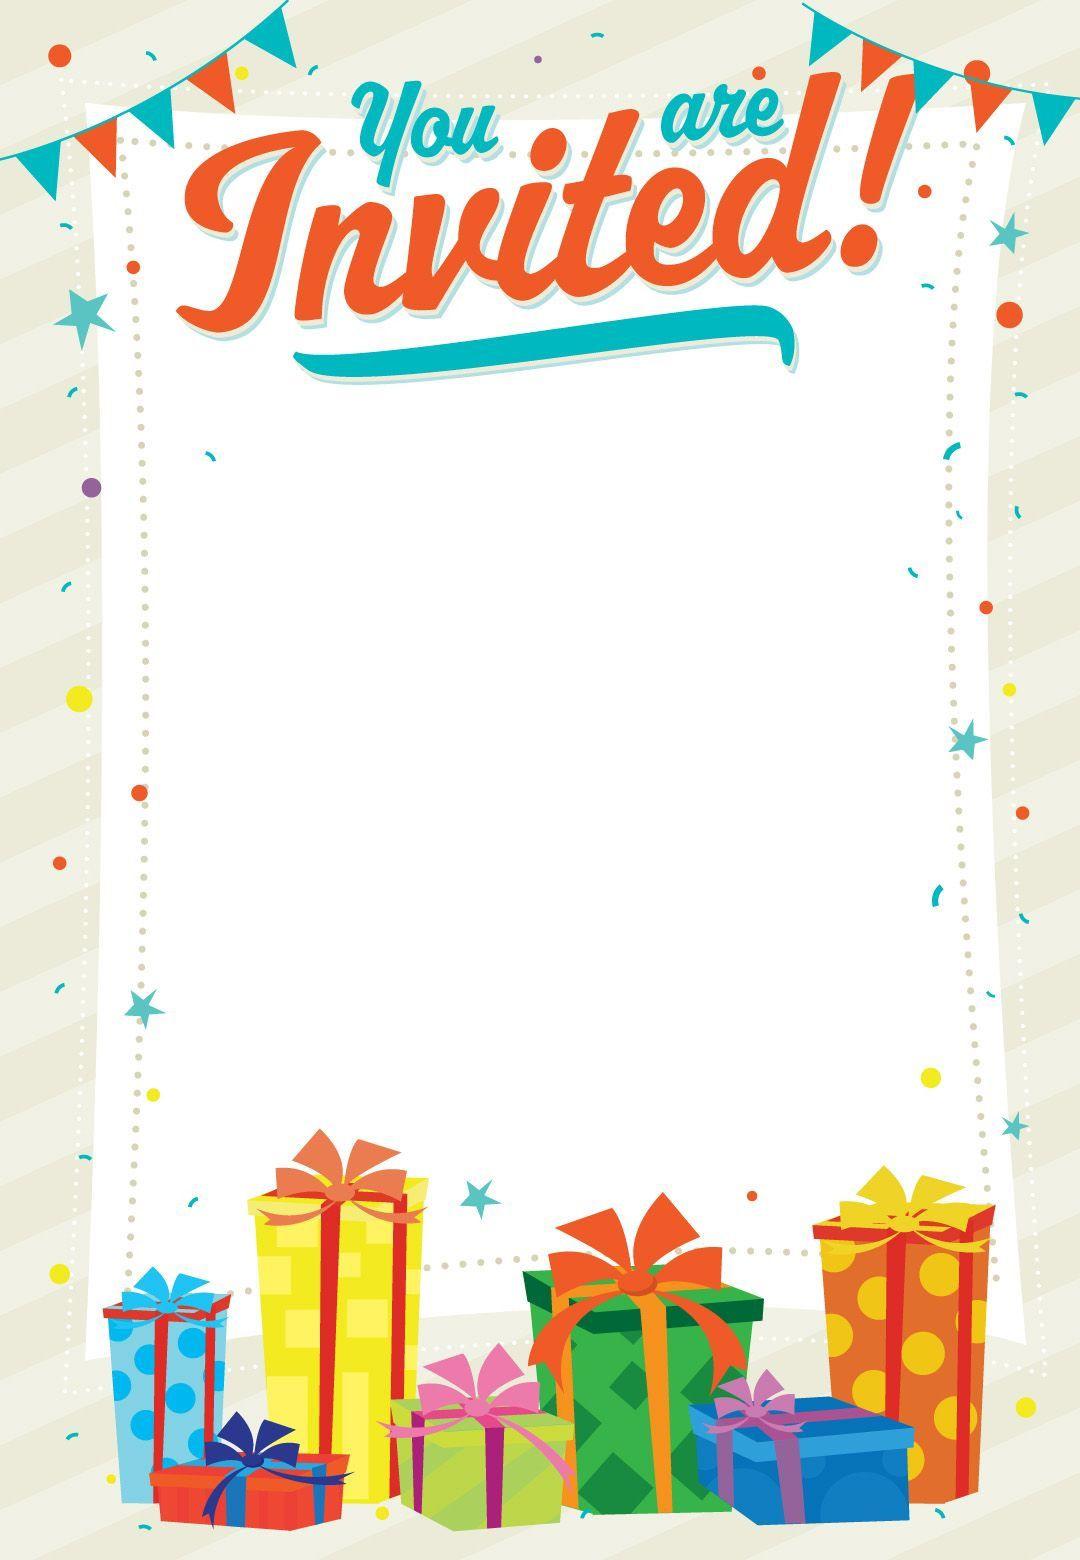 001 Sensational Birthday Card Template Free Concept  Invitation Photoshop Download WordFull